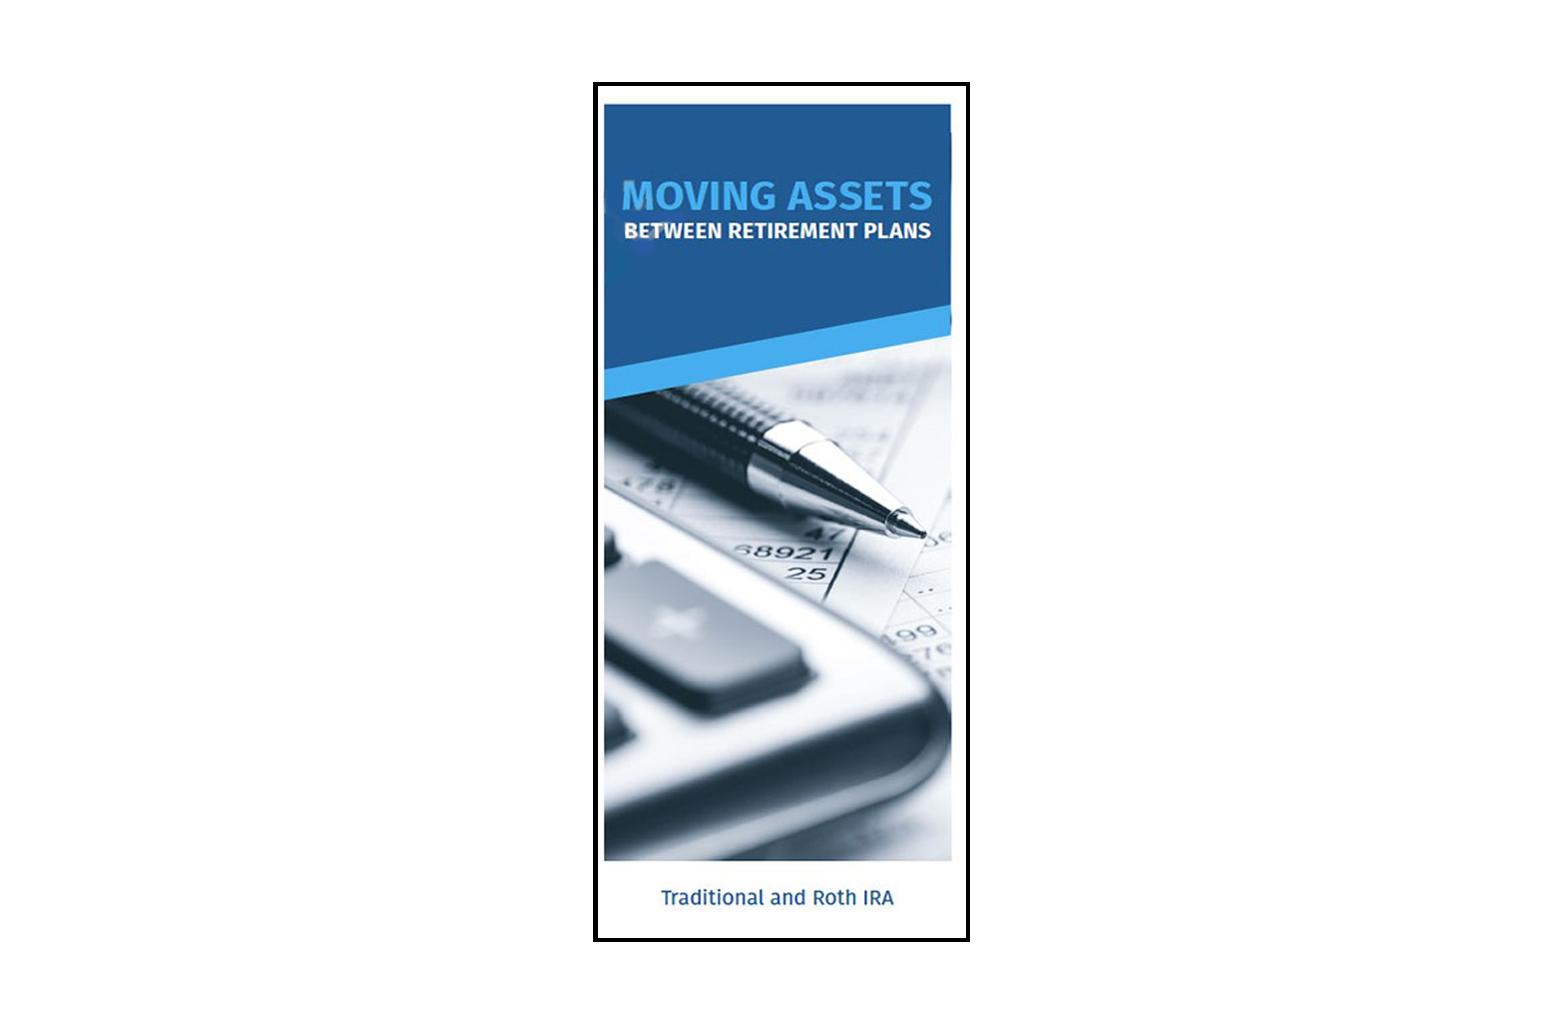 Moving Assets Between Retirement Plans Brochure